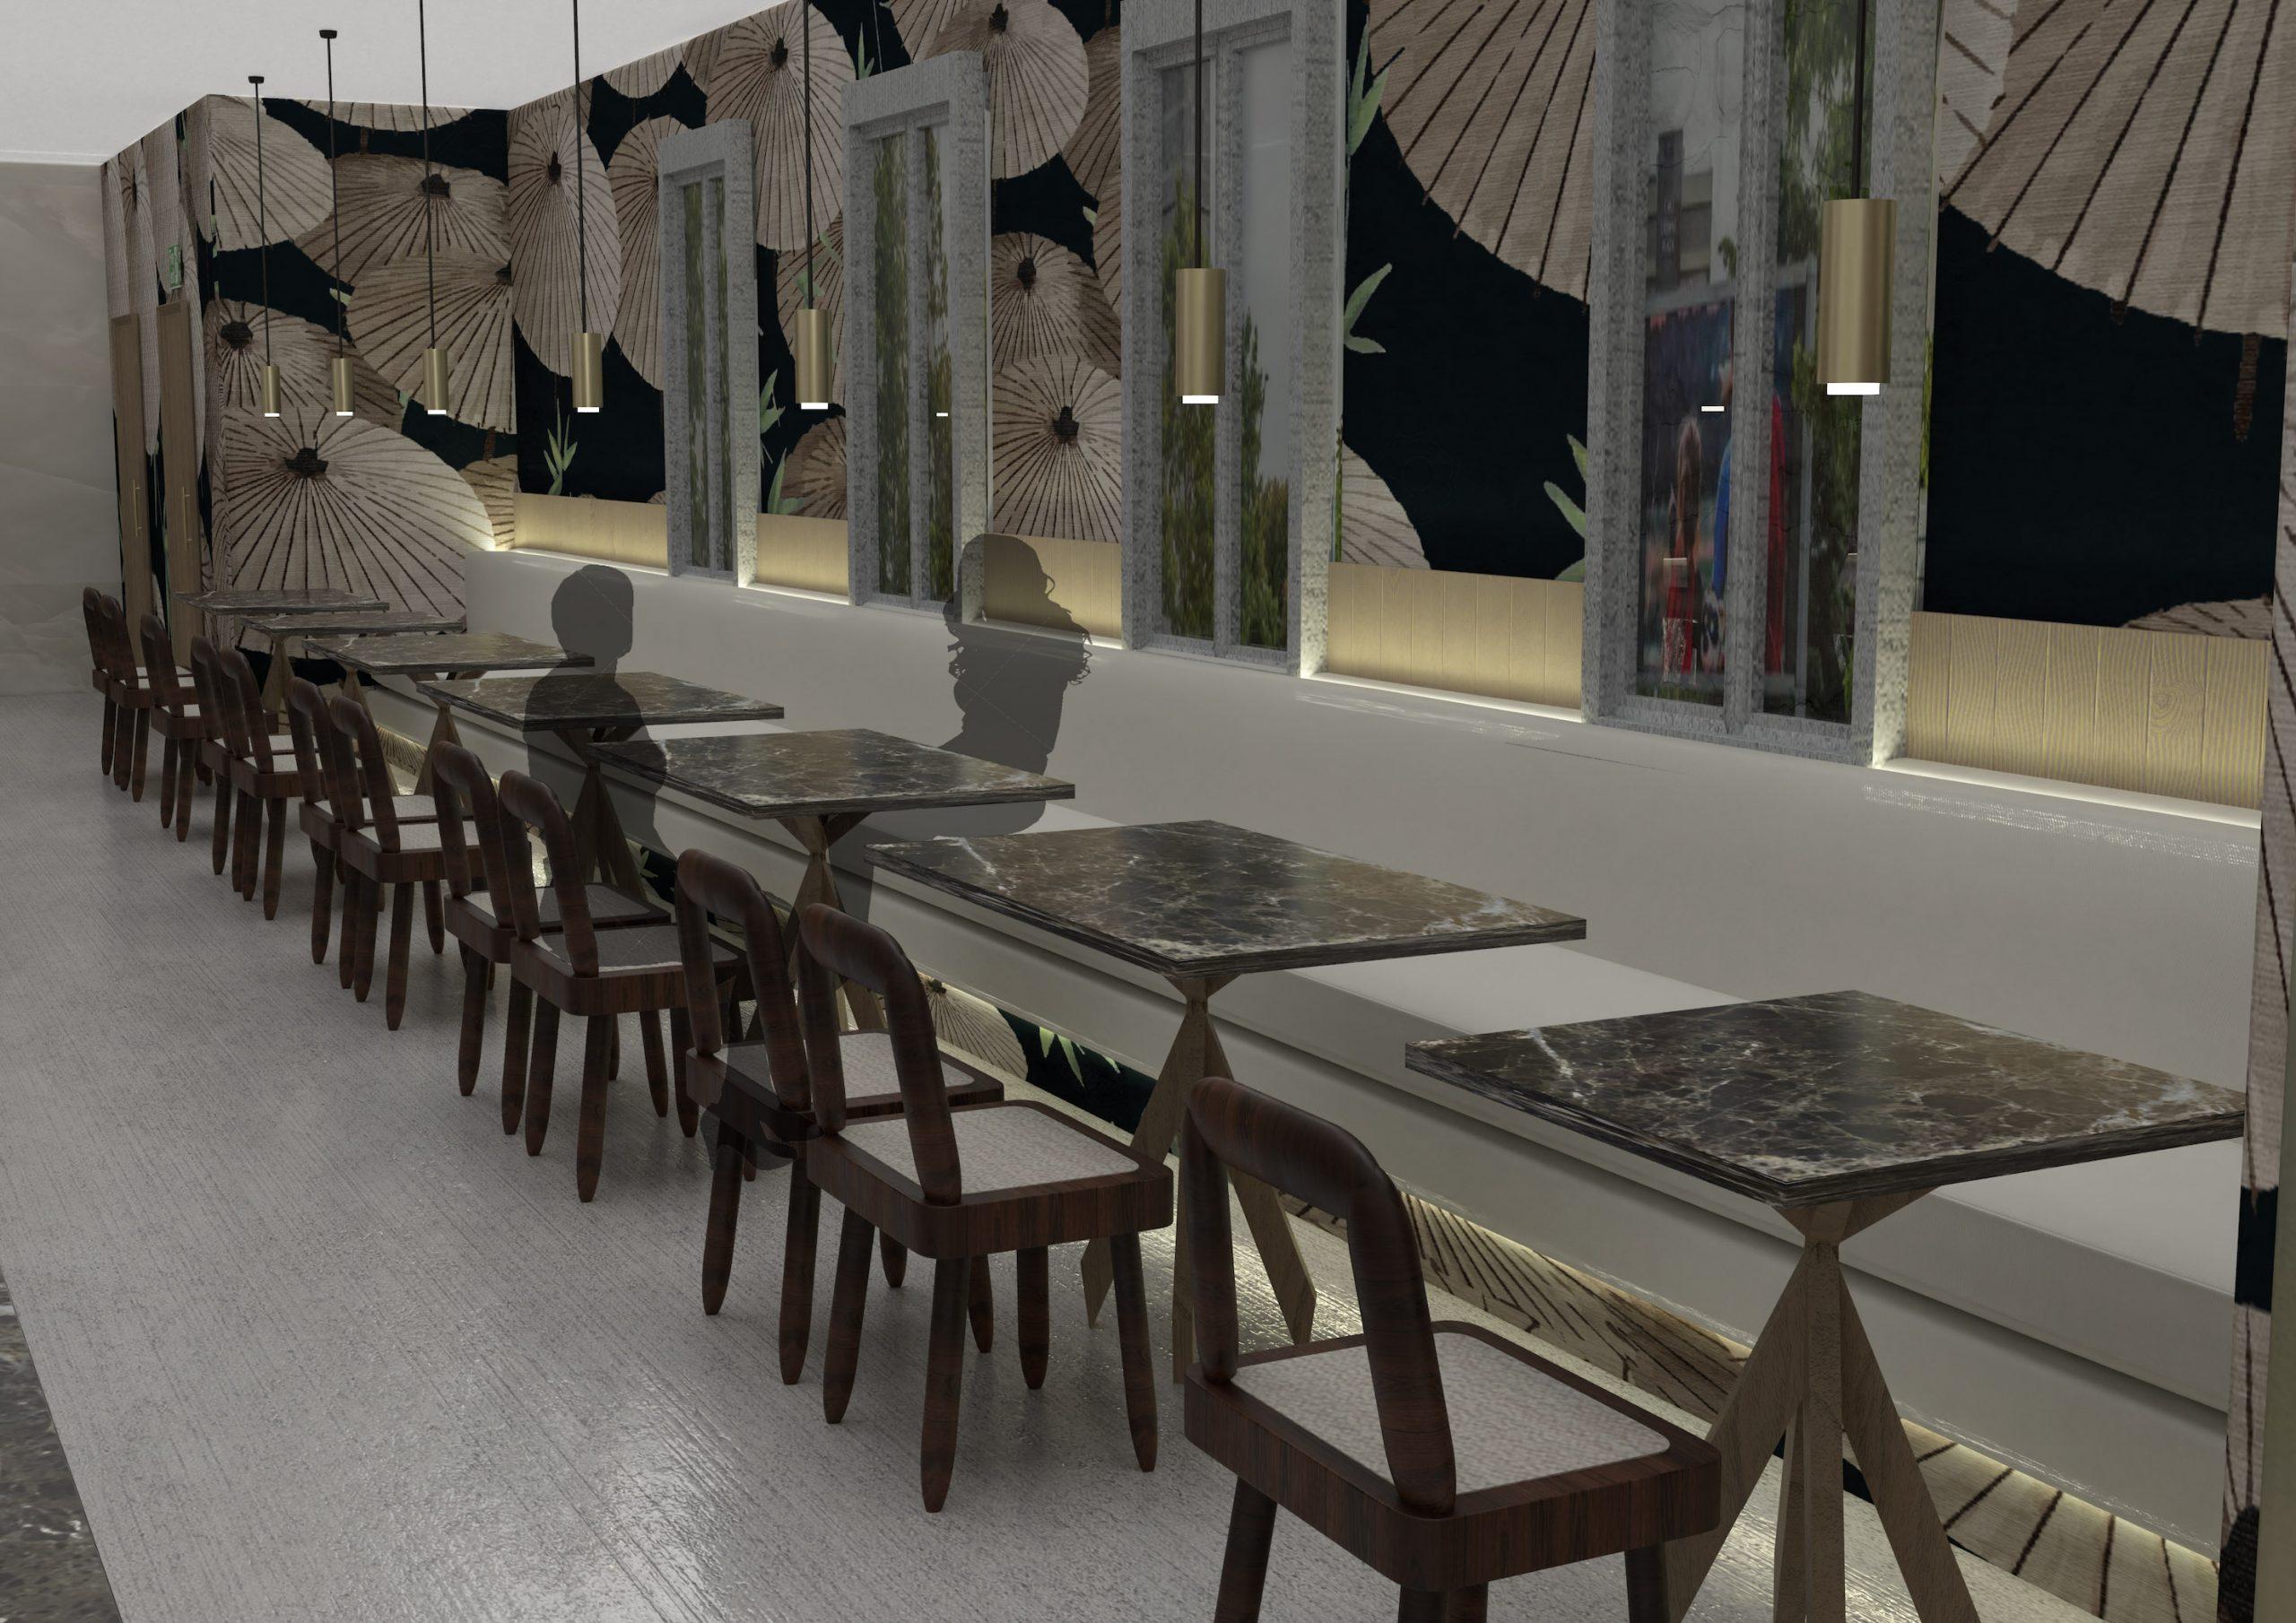 KUKU Japanese Restaurant, banquette seating